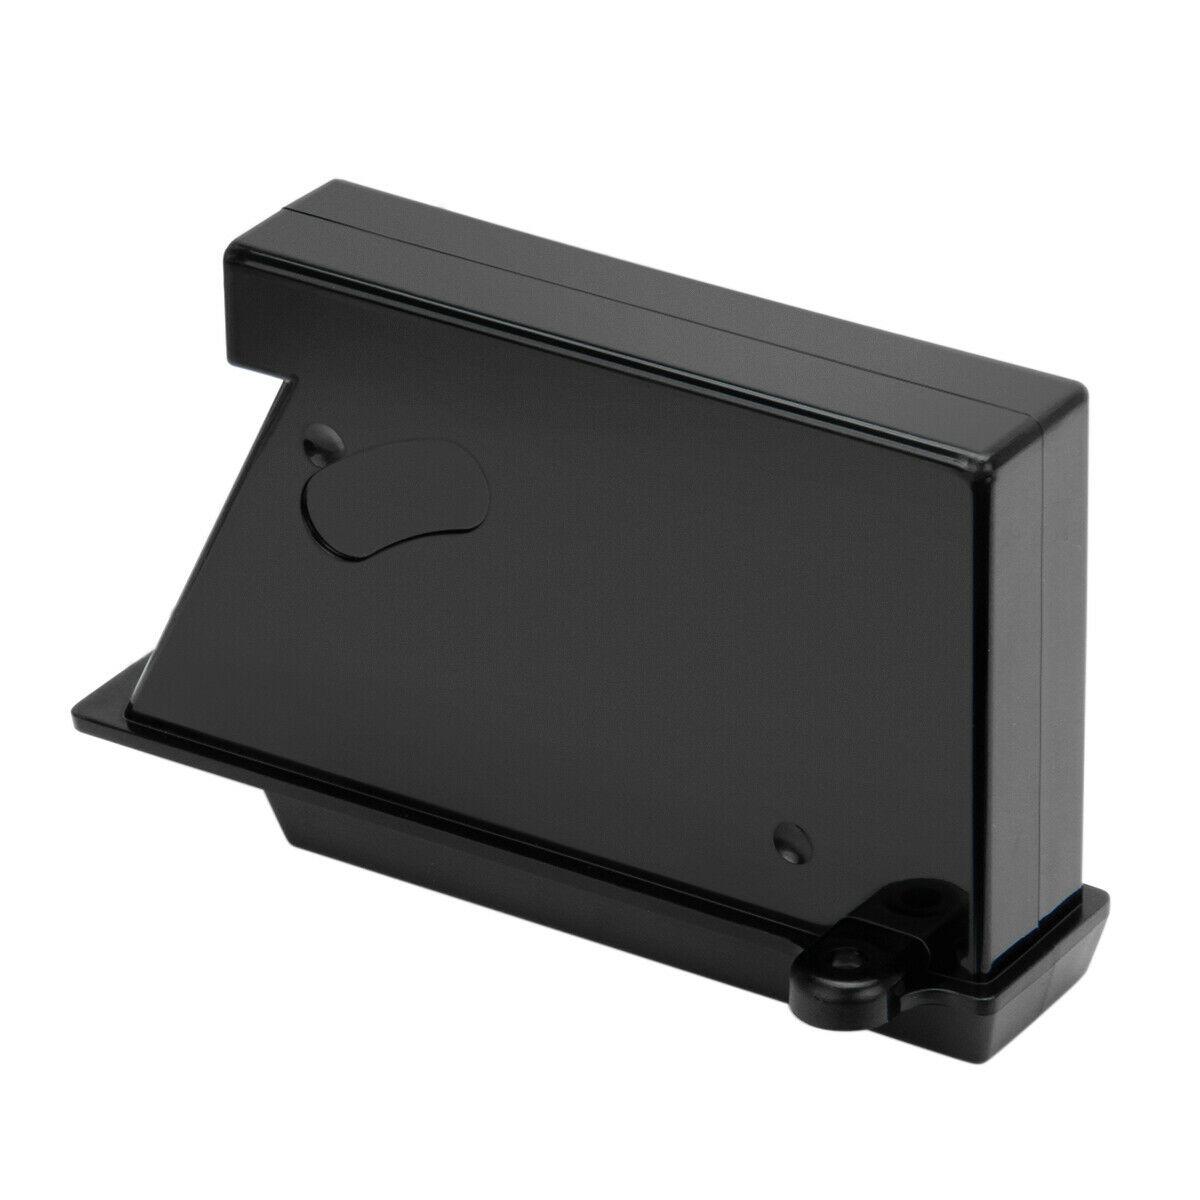 Batteri til 14,4V 3000mAh Li-Ion LG EAC60766110 EAC60766111 EAC60766112 (kompatibelt)